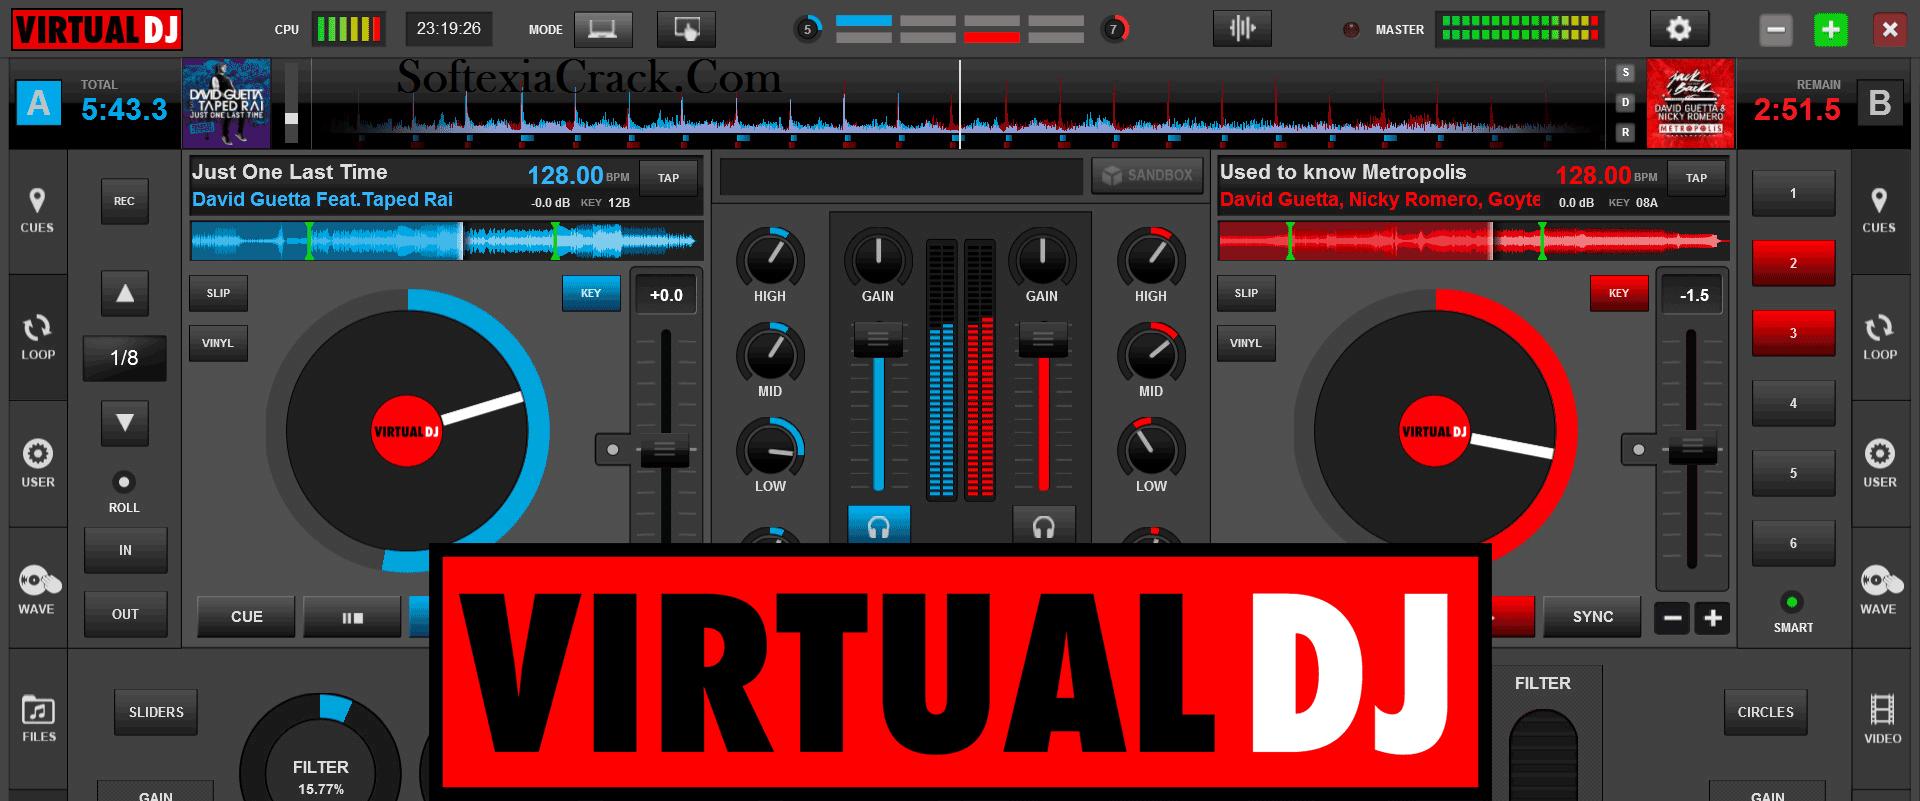 Virtual DJ Pro 2021 Build 6156 Crack + serial number Free Download